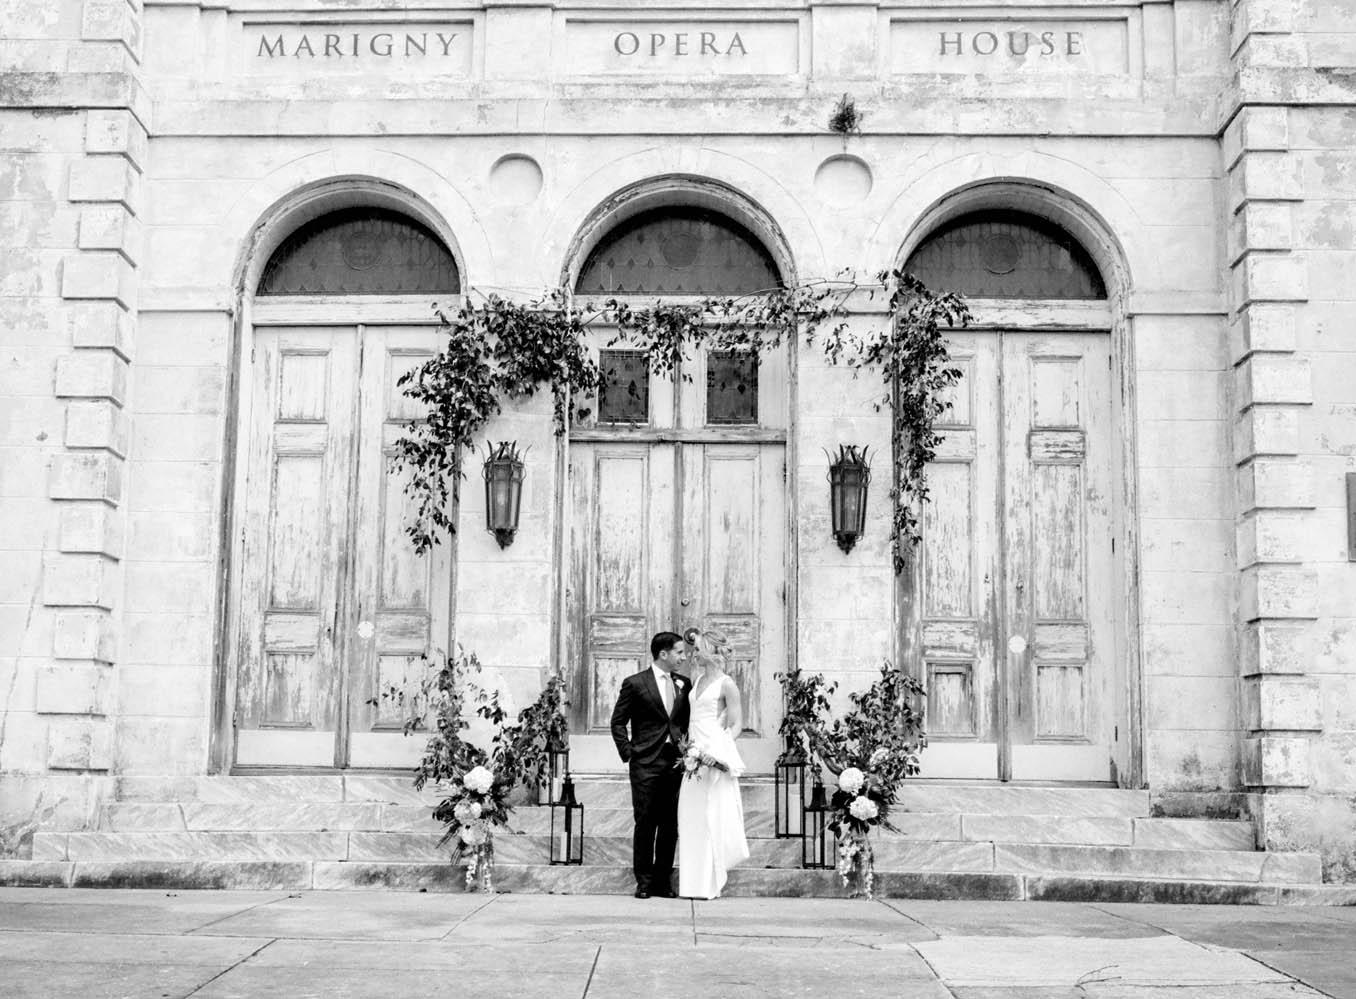 new orleans marigny opera house wedding 01